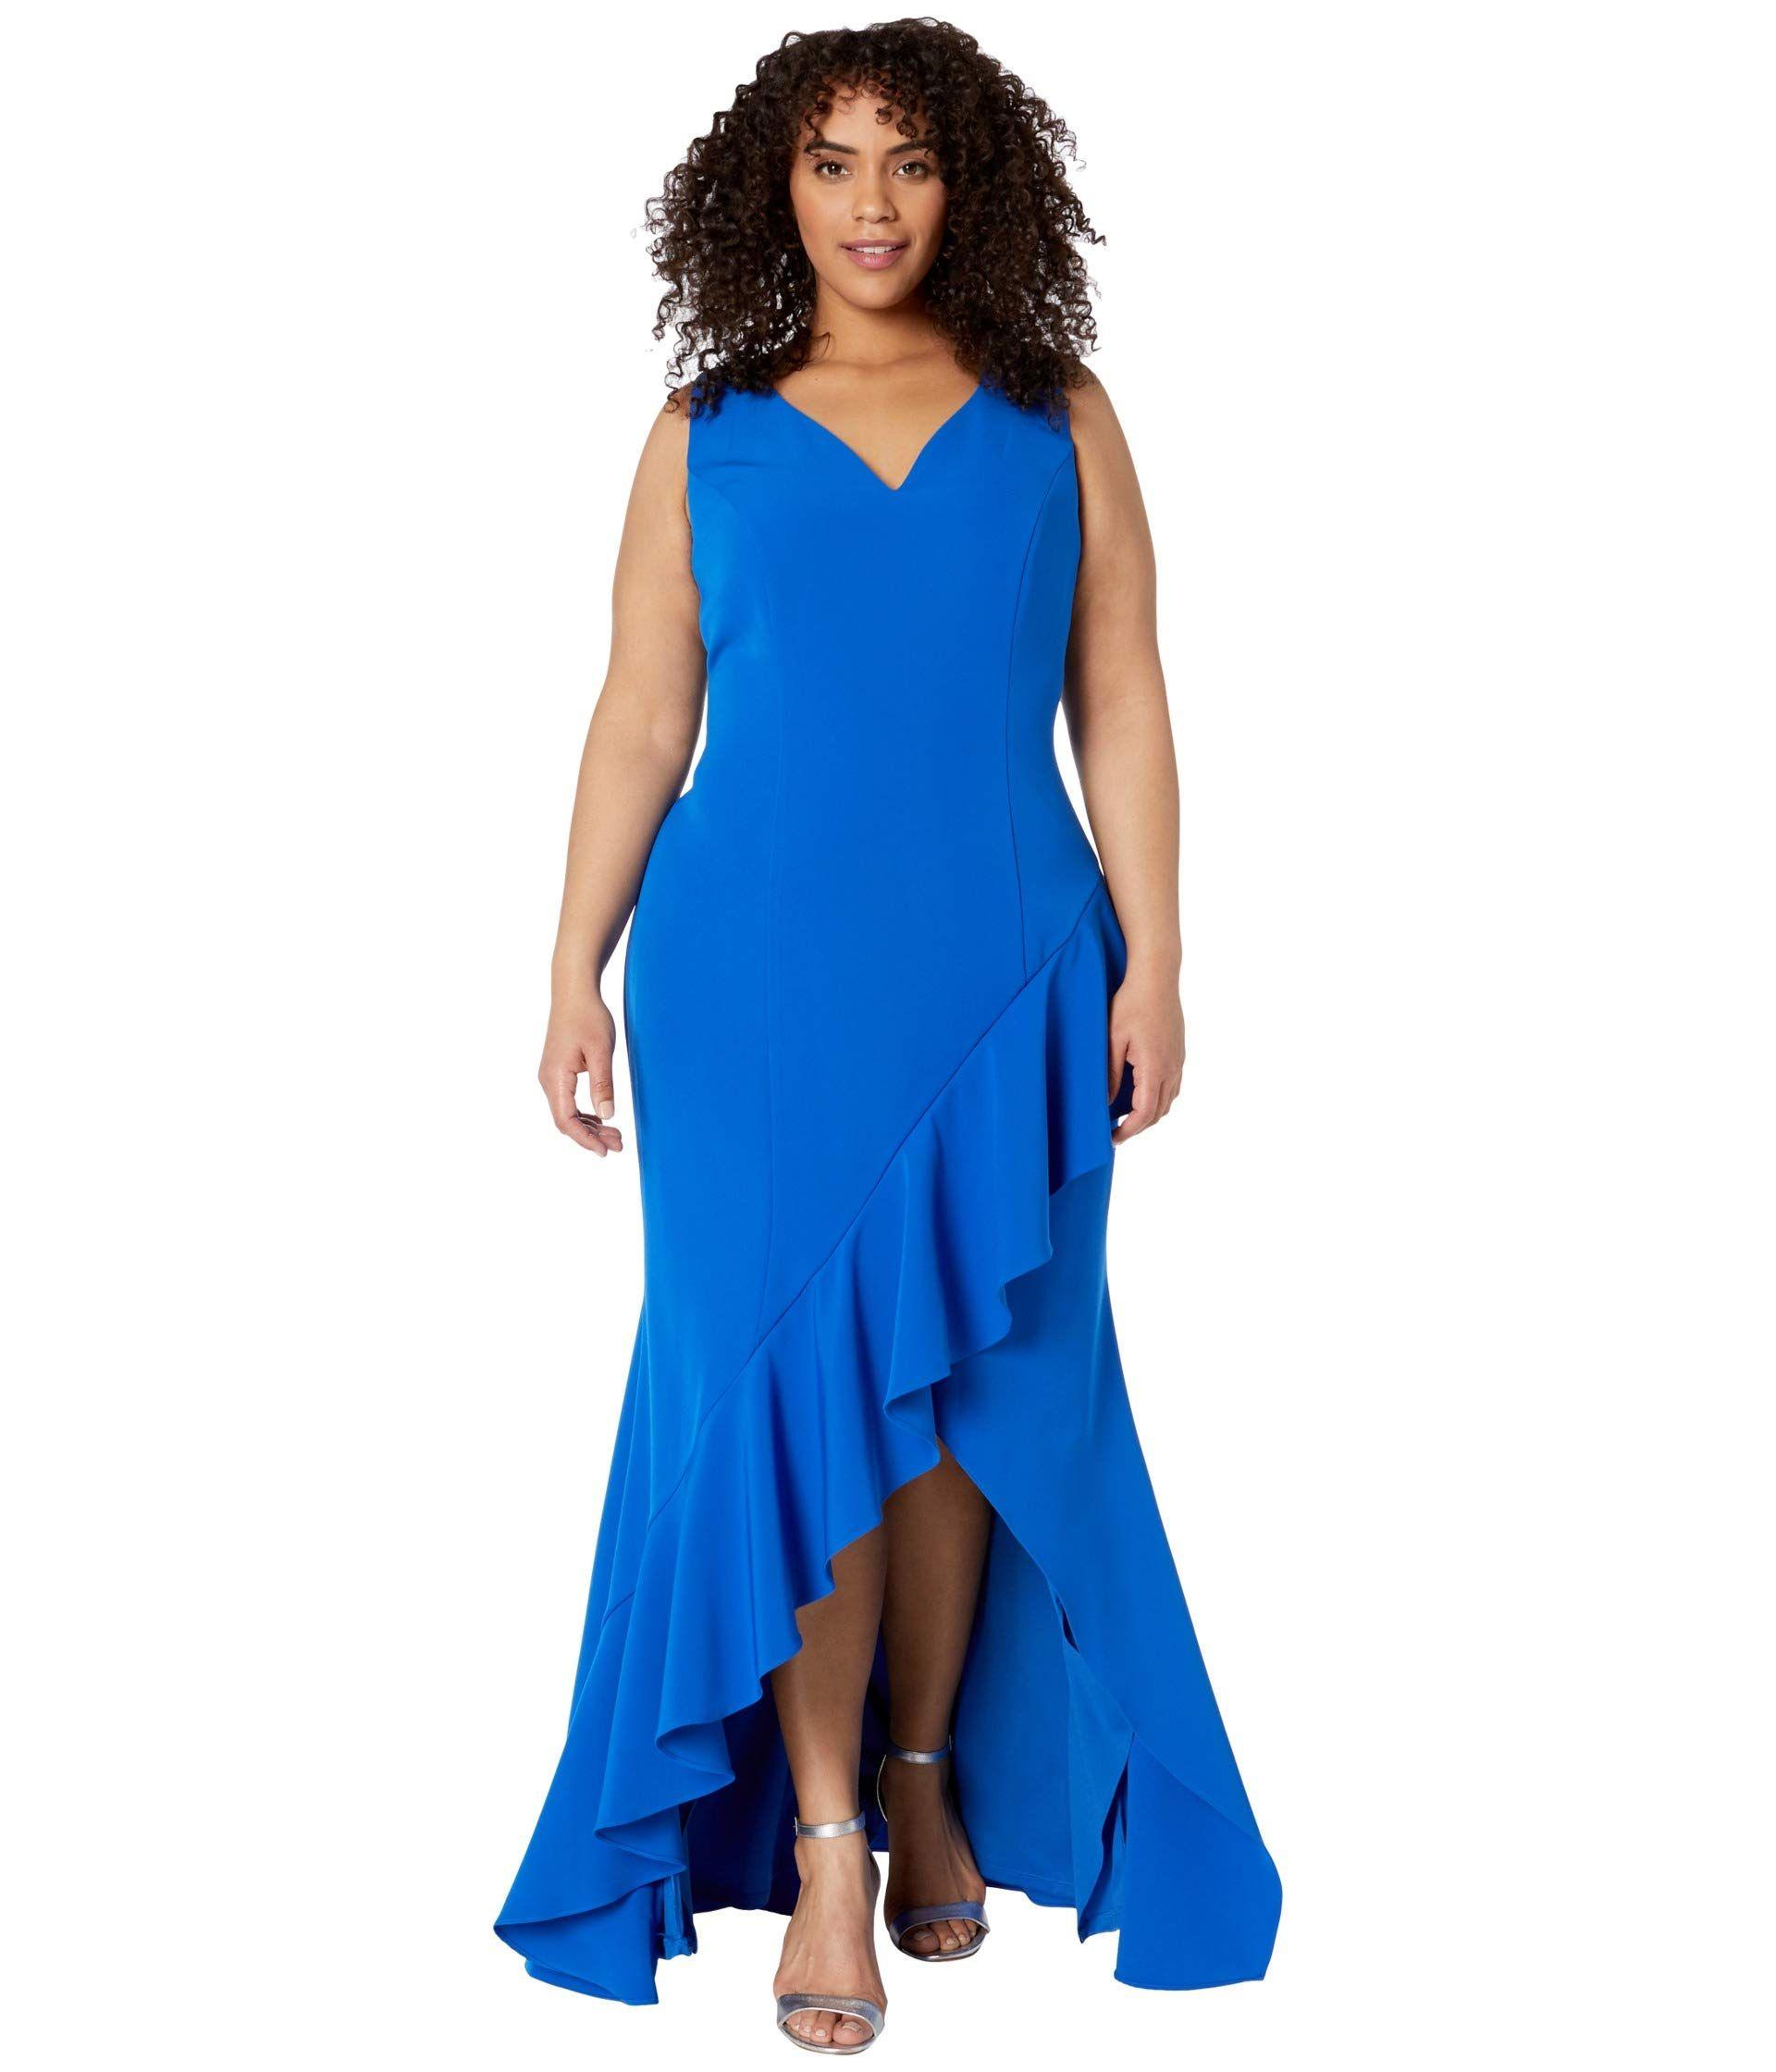 20 Flattering Plus Size Wedding Guest Dresses for Summer 20